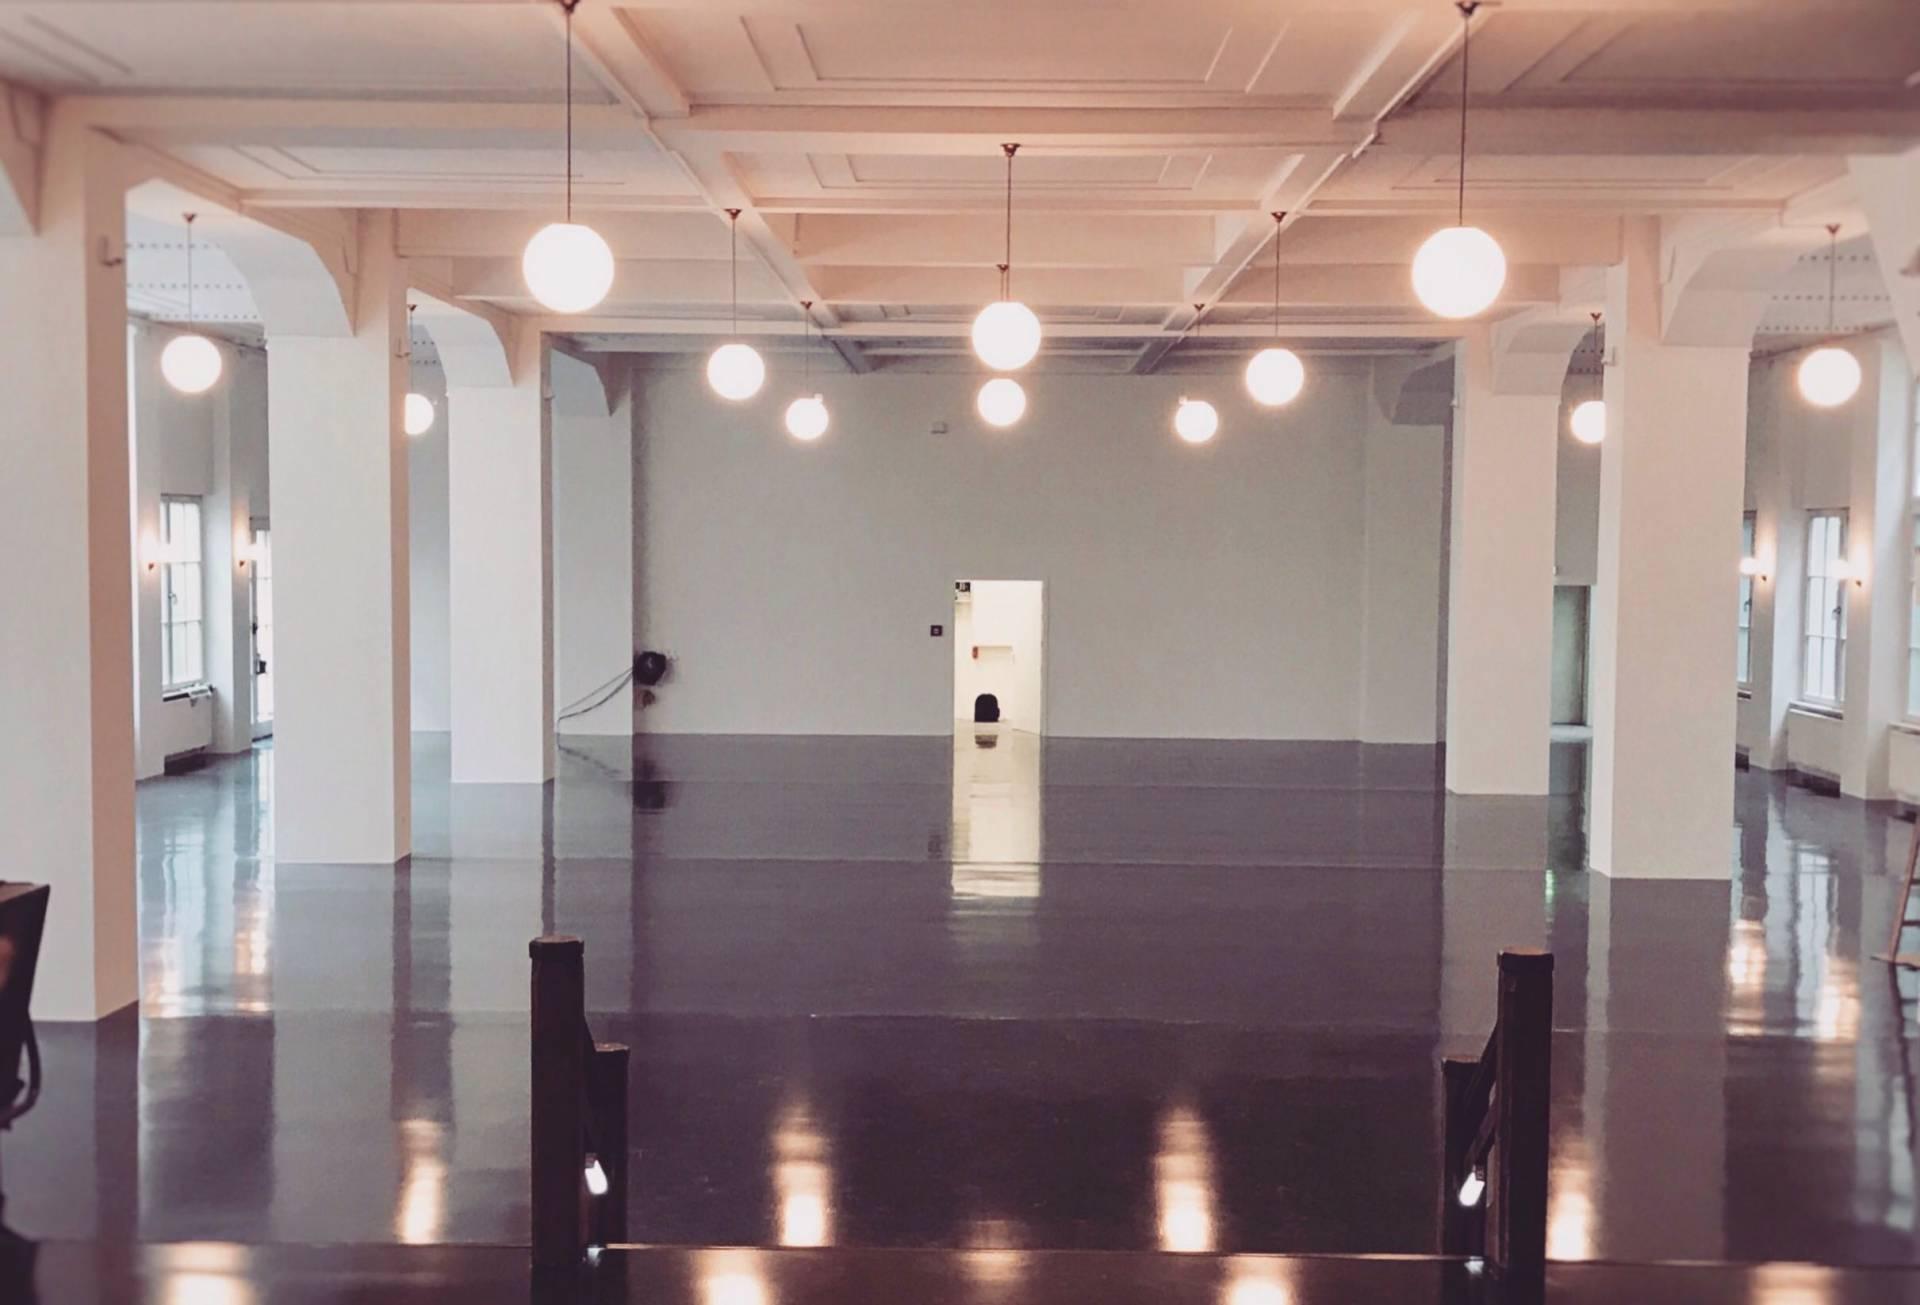 Umbau Kupfersaal August 2017 (Umbau zum Kupfersaal, Blick zum Saal)